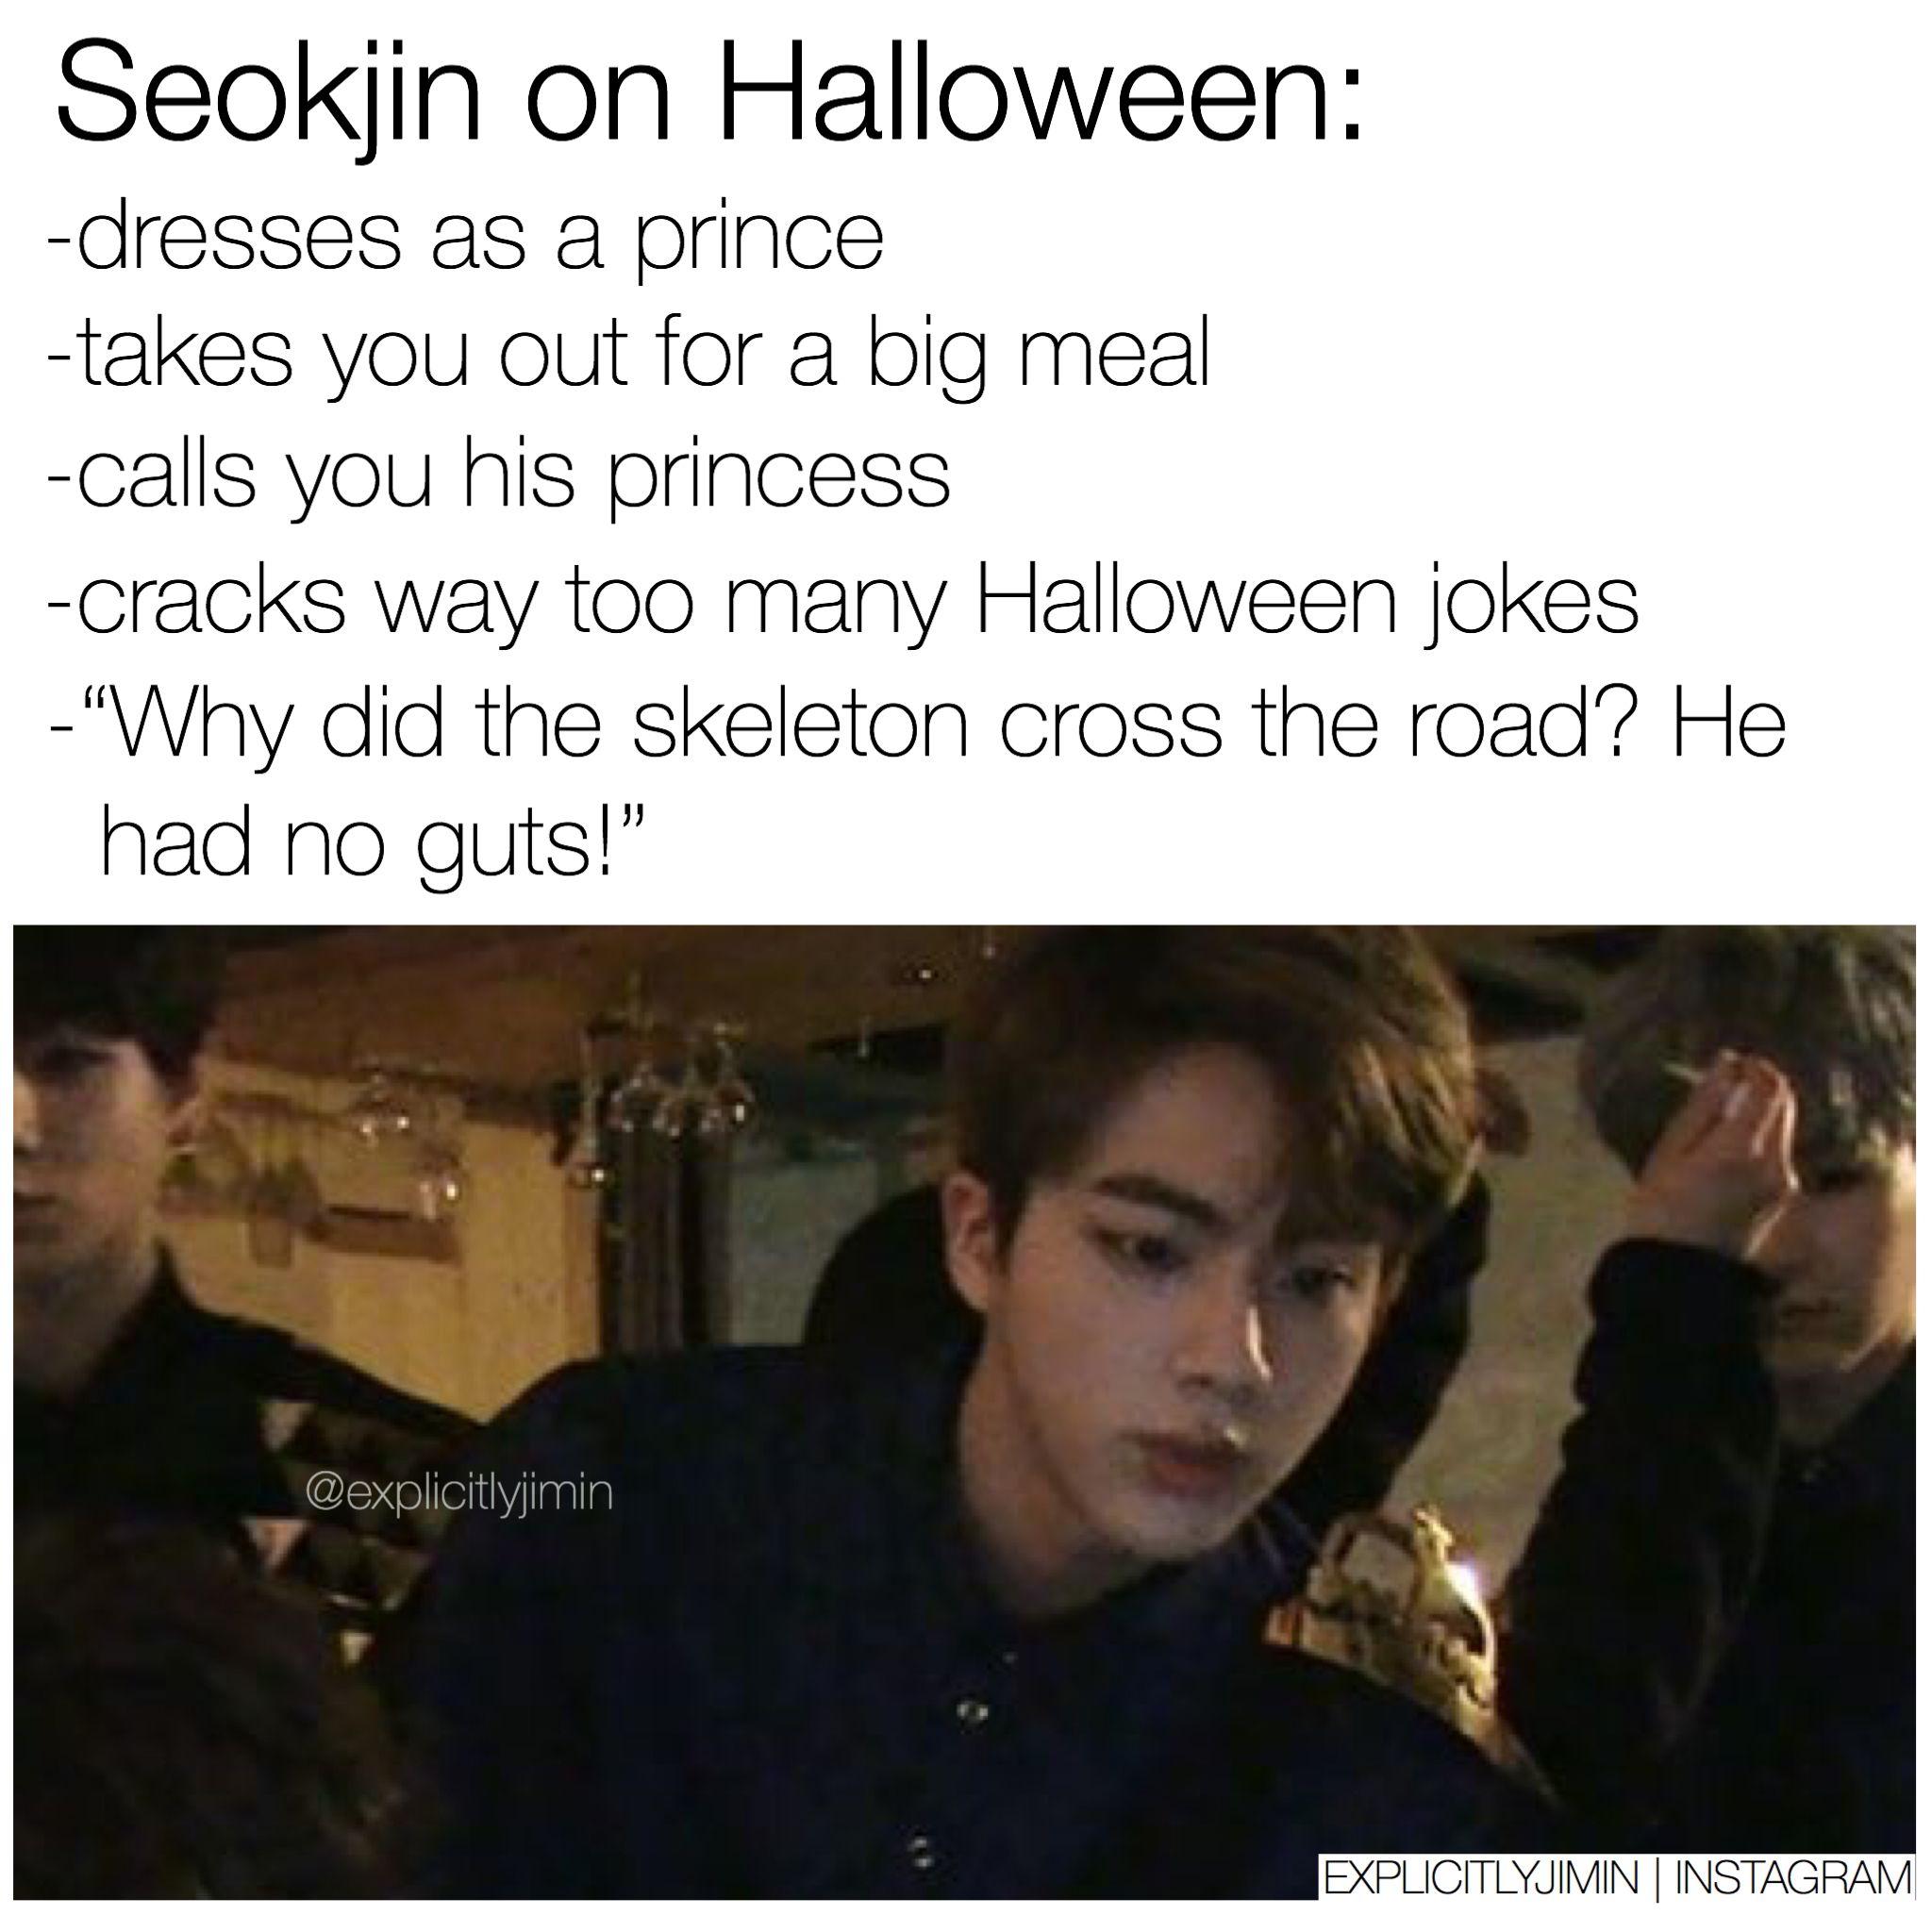 Halloween Seokjin Imagine | kmemes | Bts, Bts jin, Bts scenarios